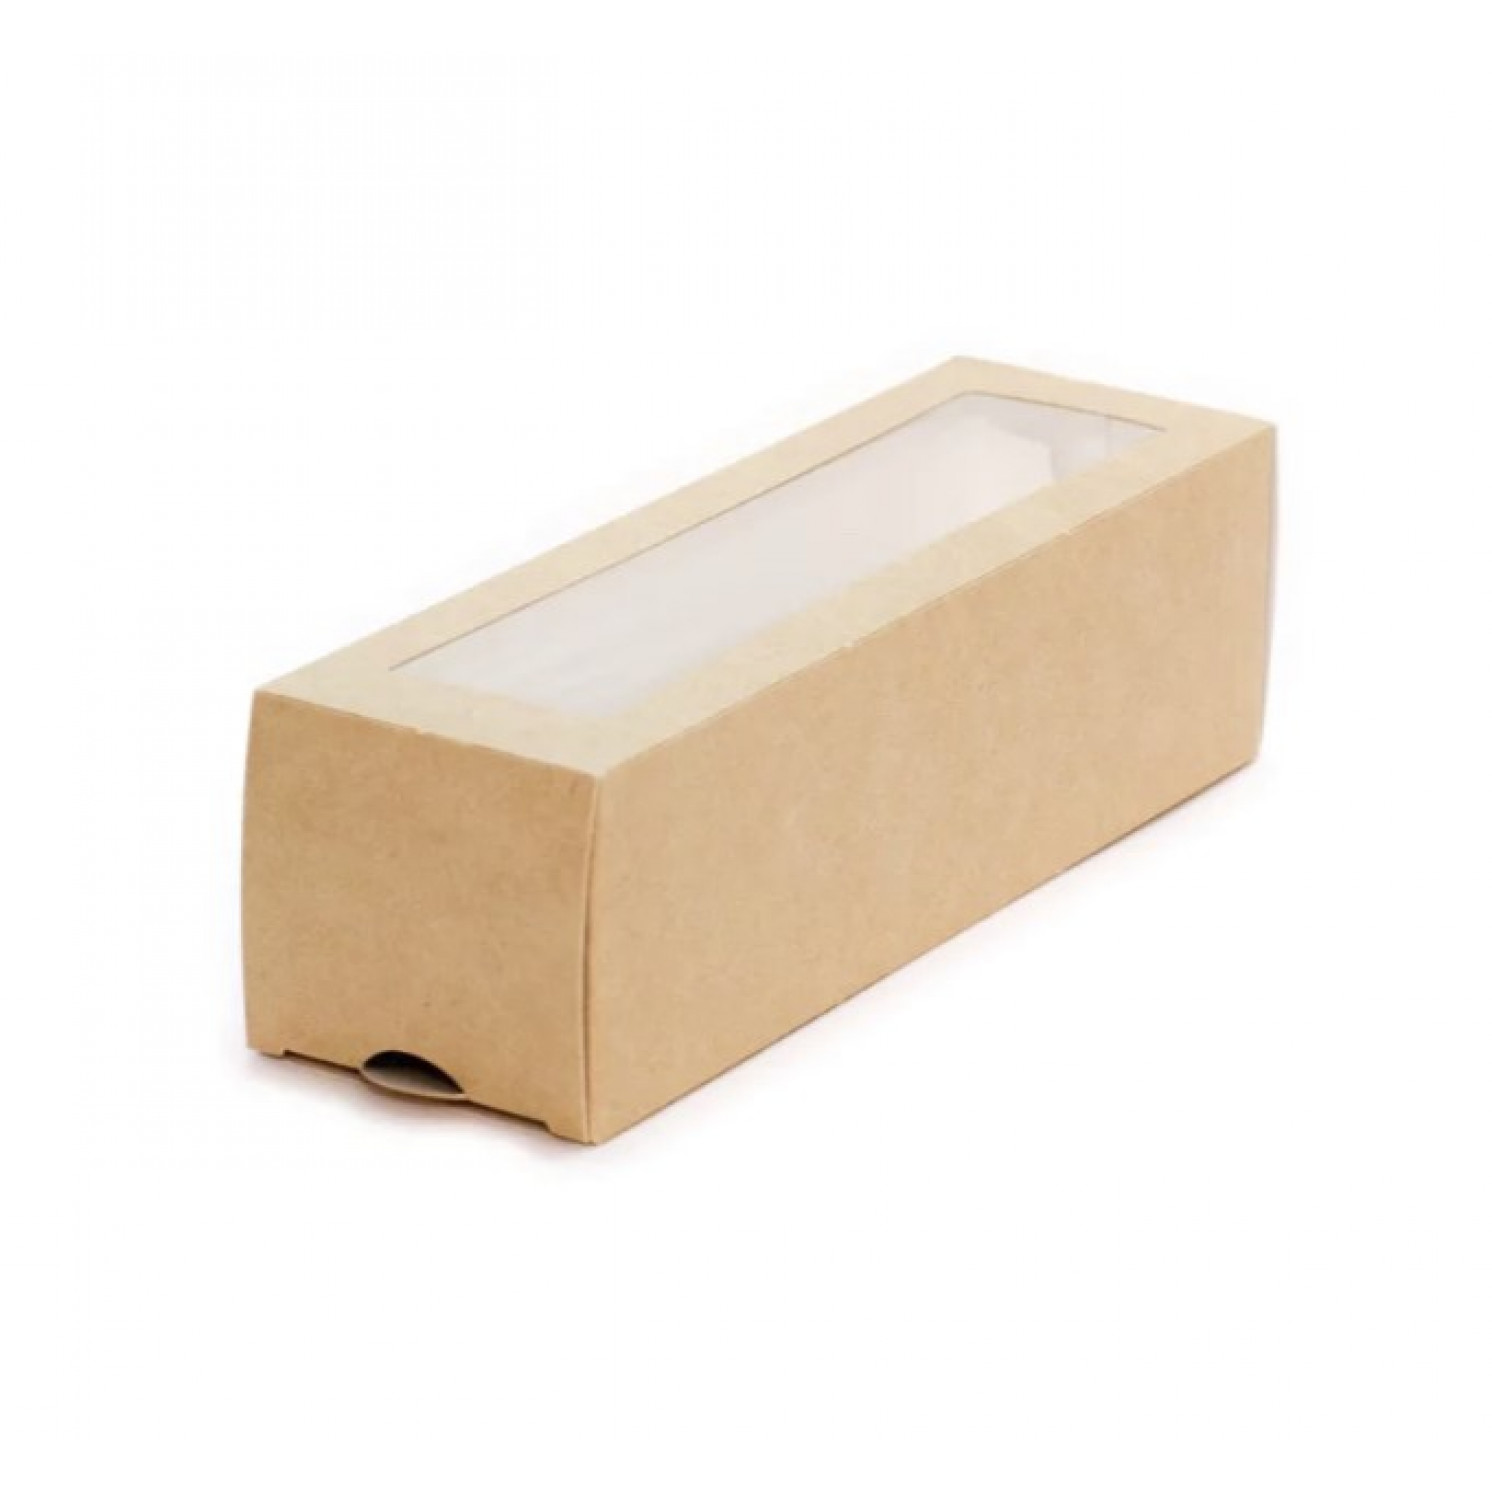 Упаковка для Макаро́н (Macaron) (на 6 штук)